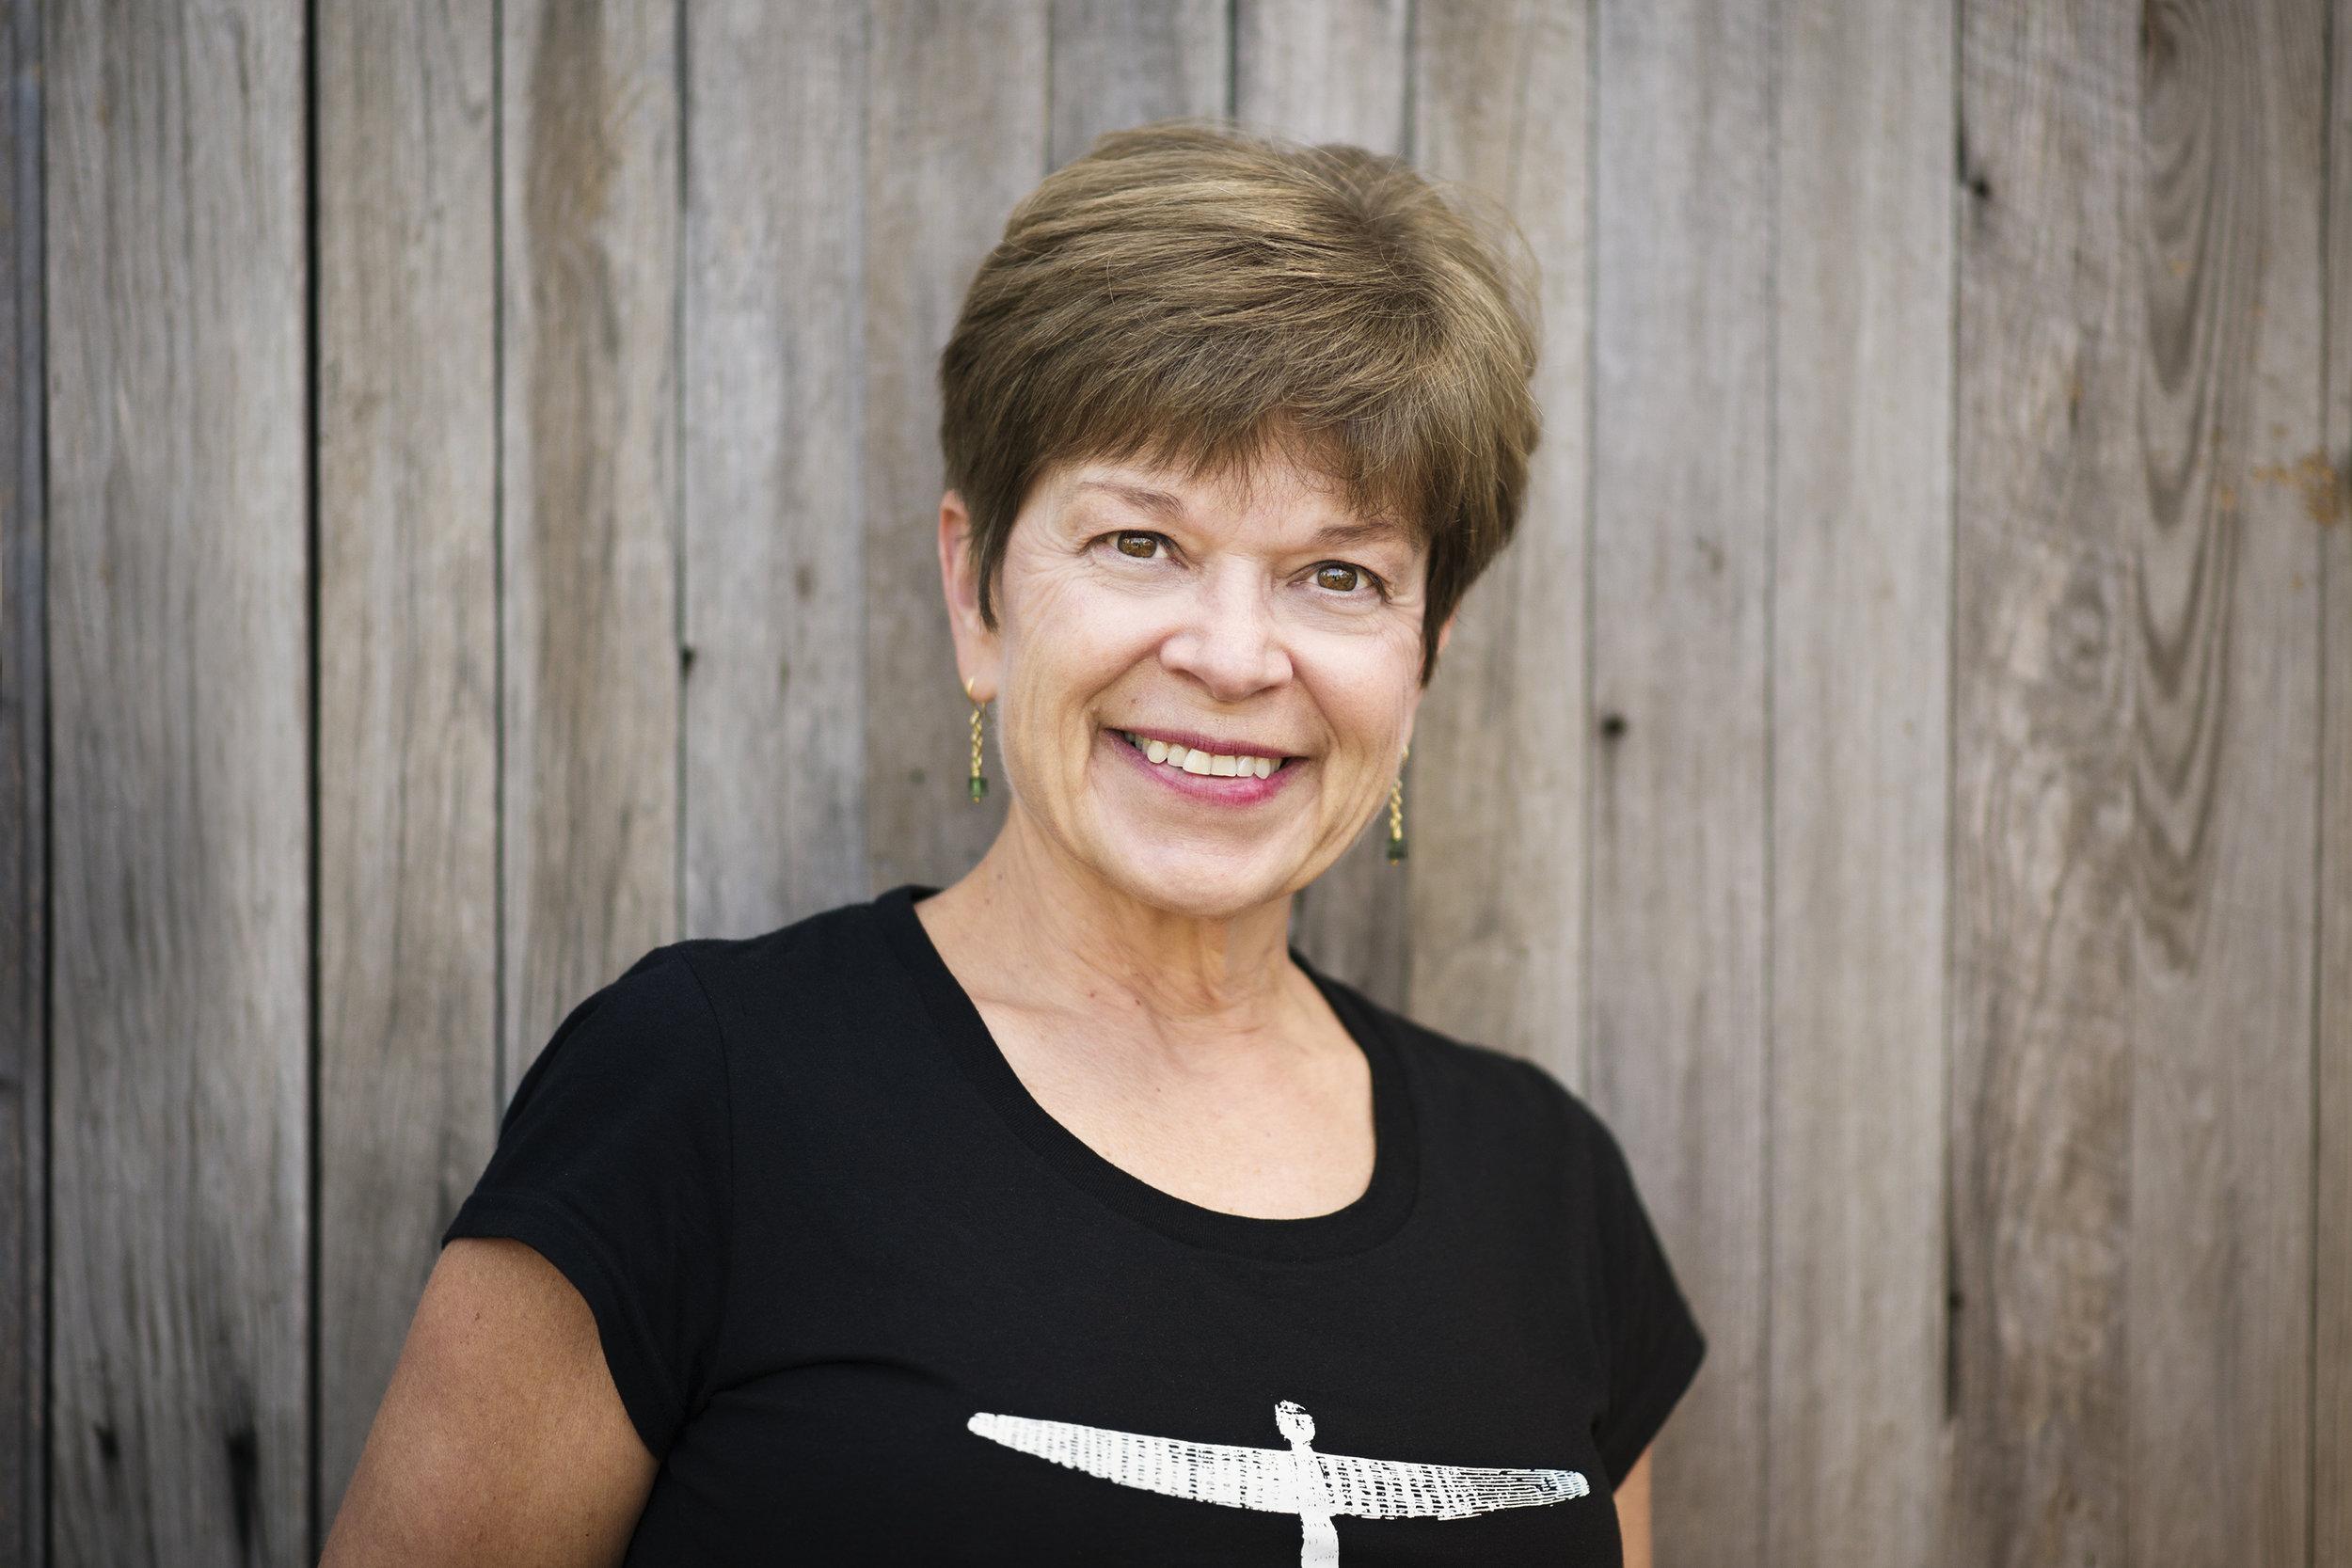 Dr. Paula Anderson, RYT200 ; Teaches in YT Program, Breathe Well Intensive